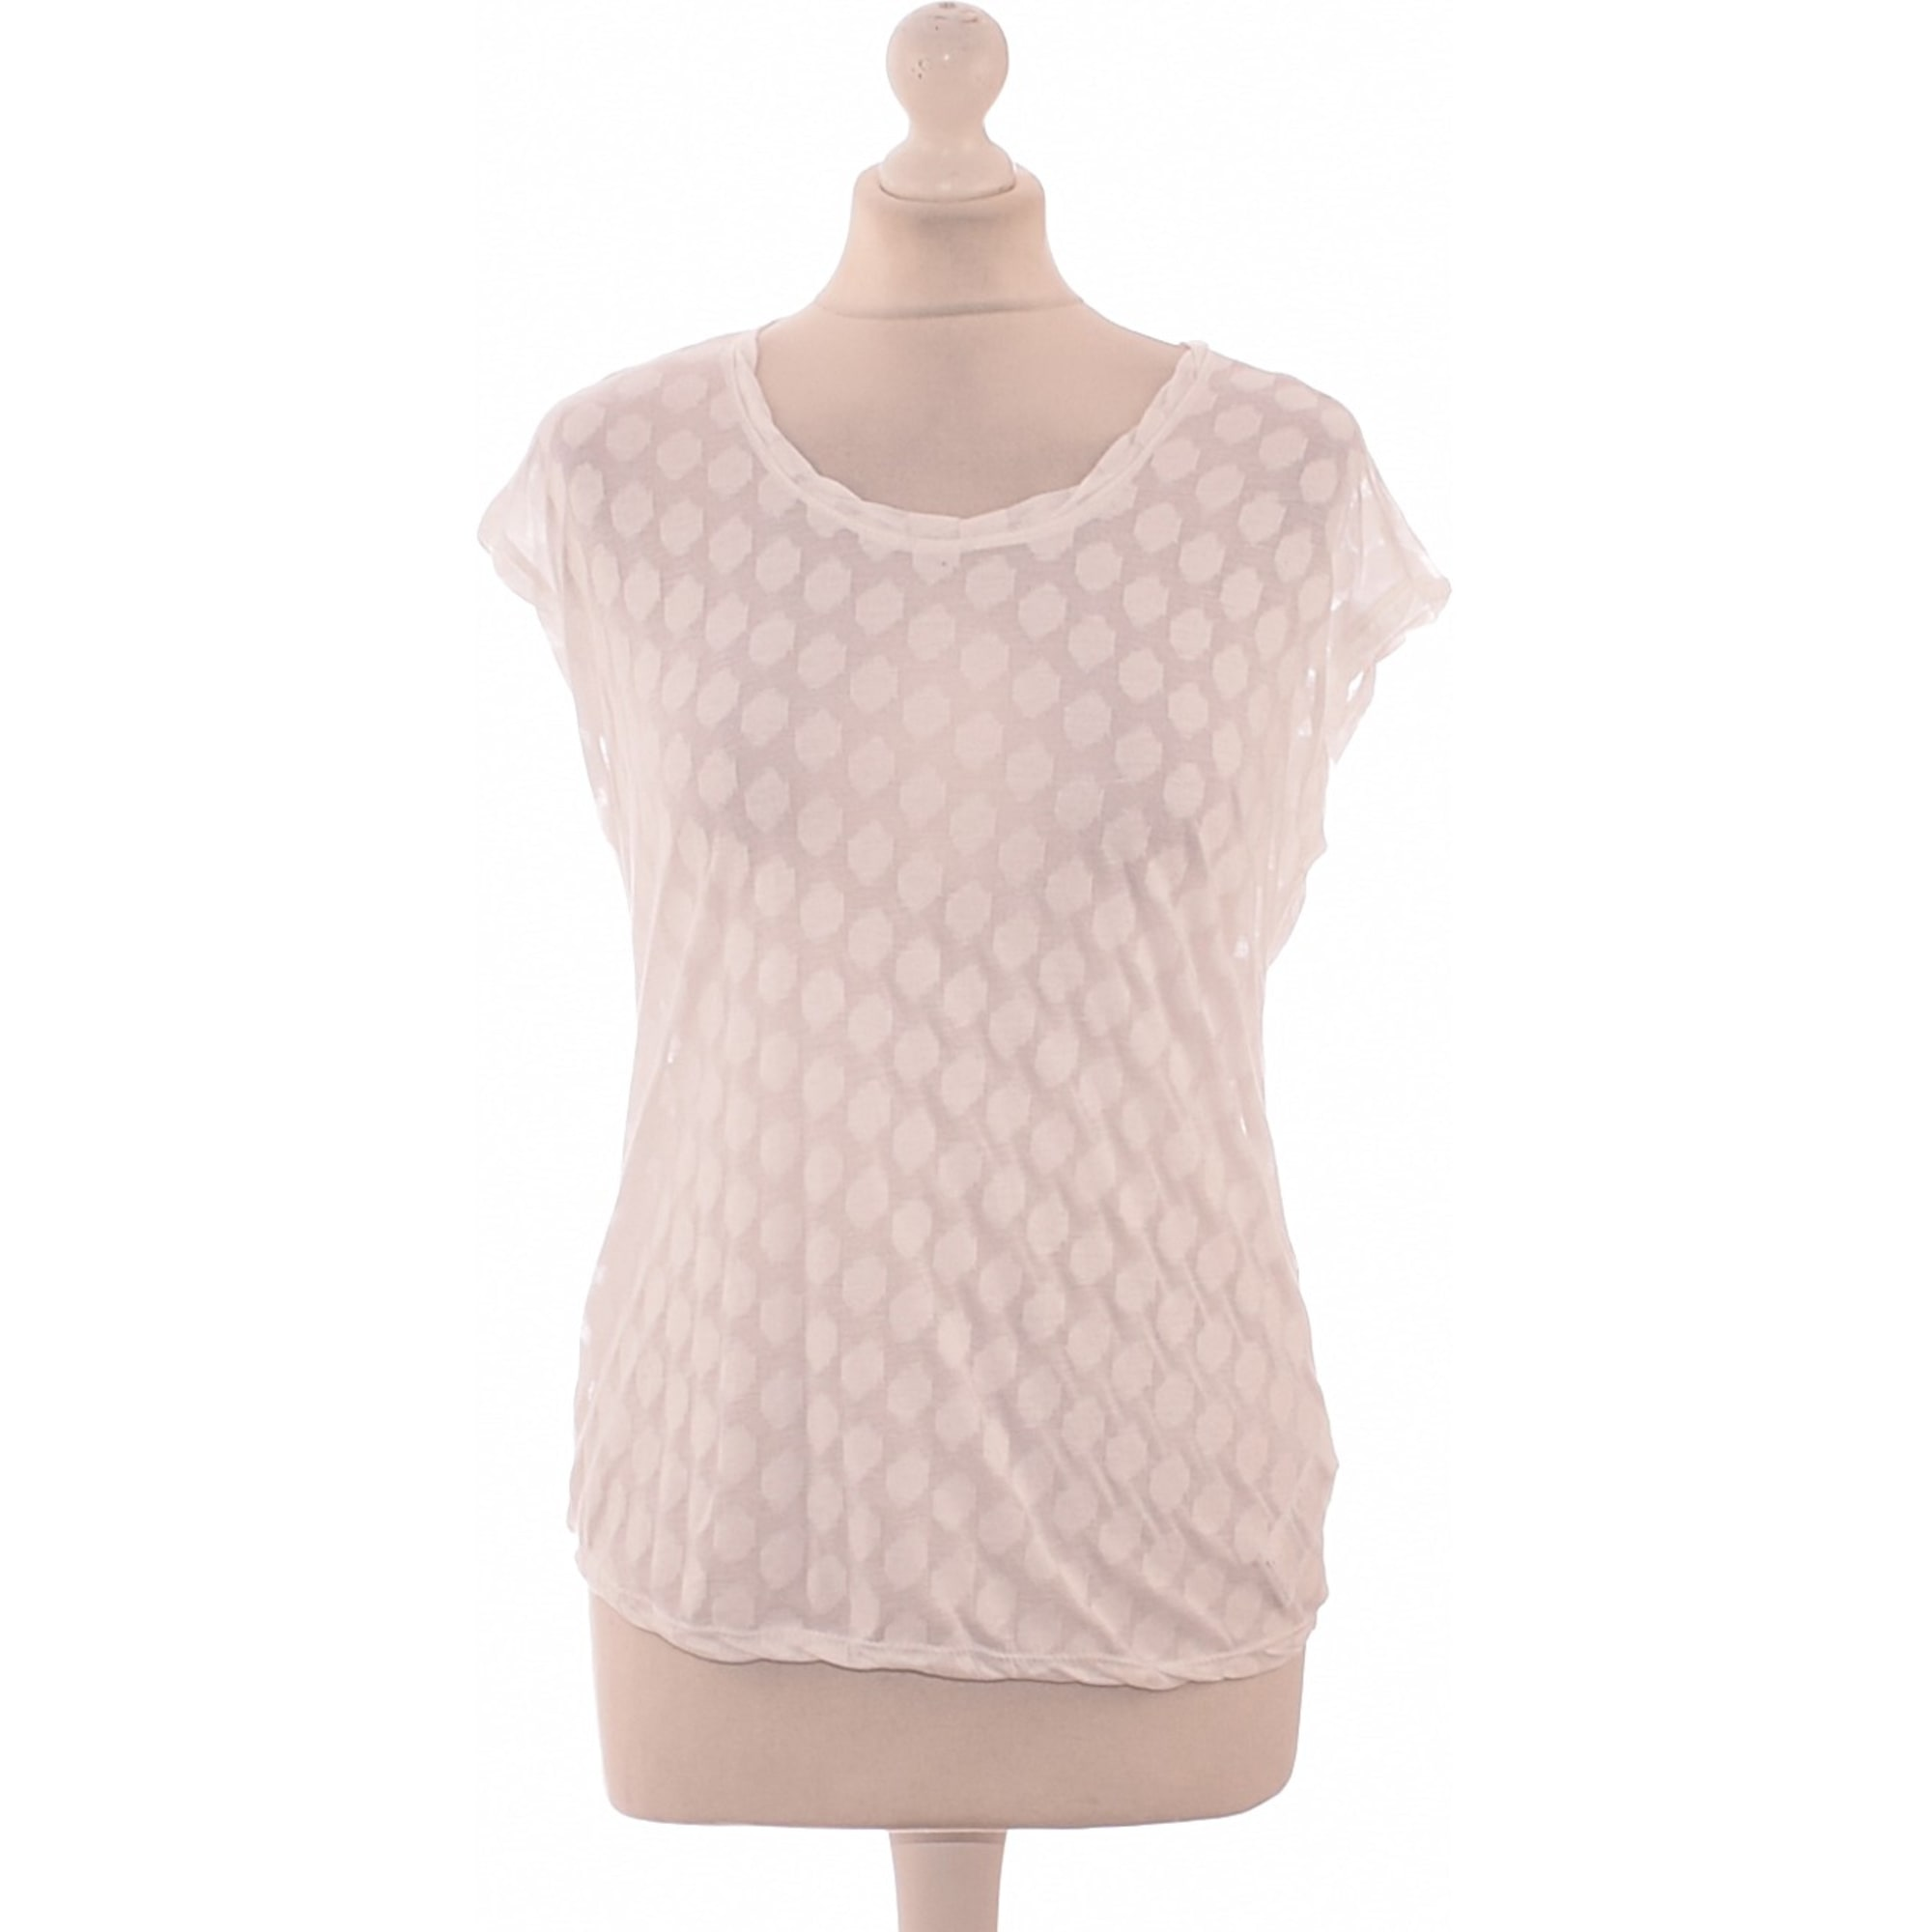 Top, T-shirt ZADIG & VOLTAIRE White, off-white, ecru